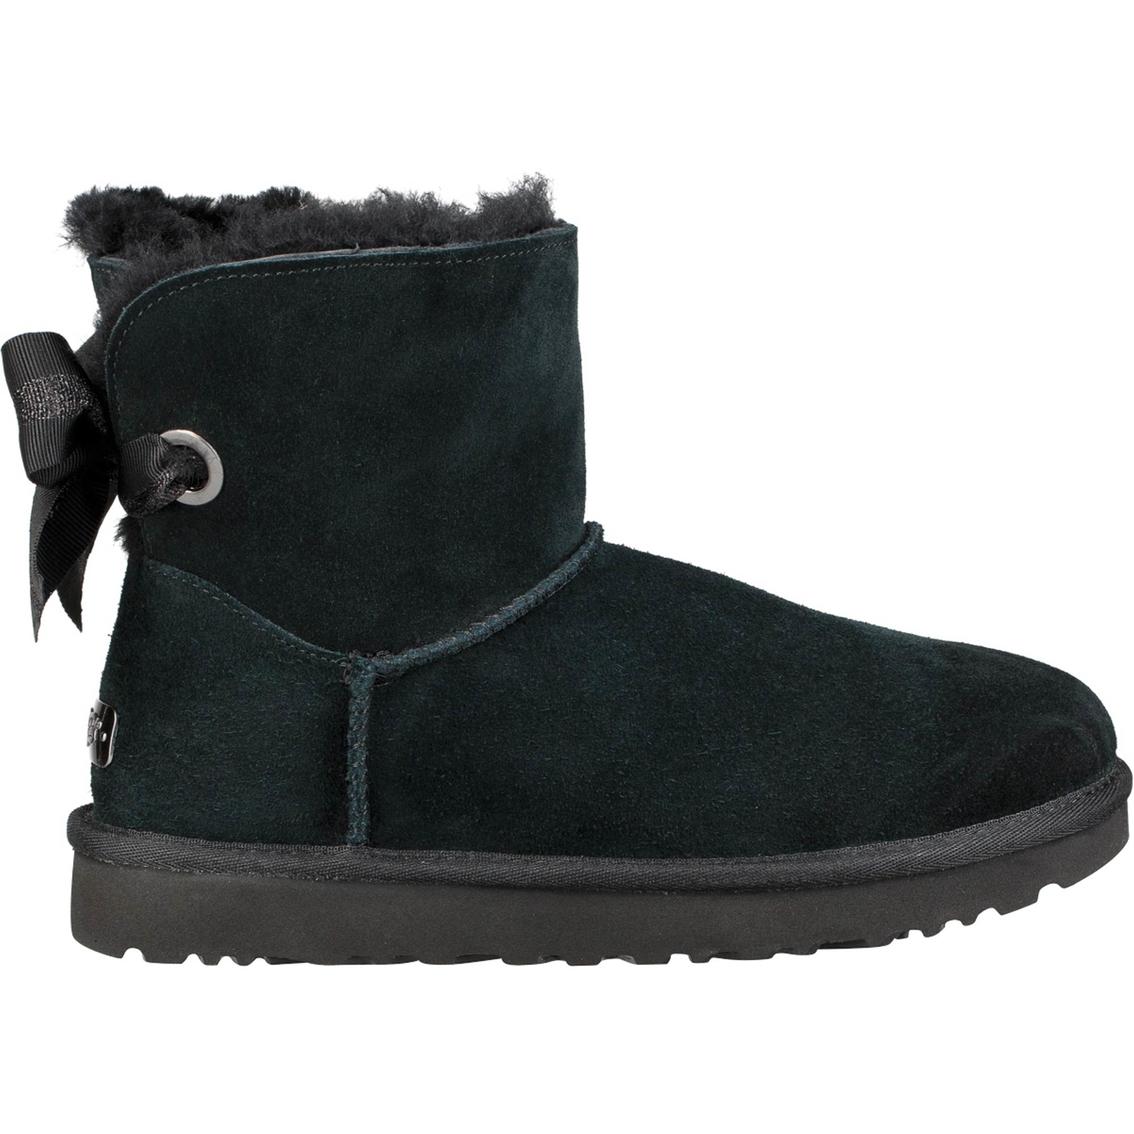 ugg customizable bailey bow mini boots booties shoes shop the rh shopmyexchange com